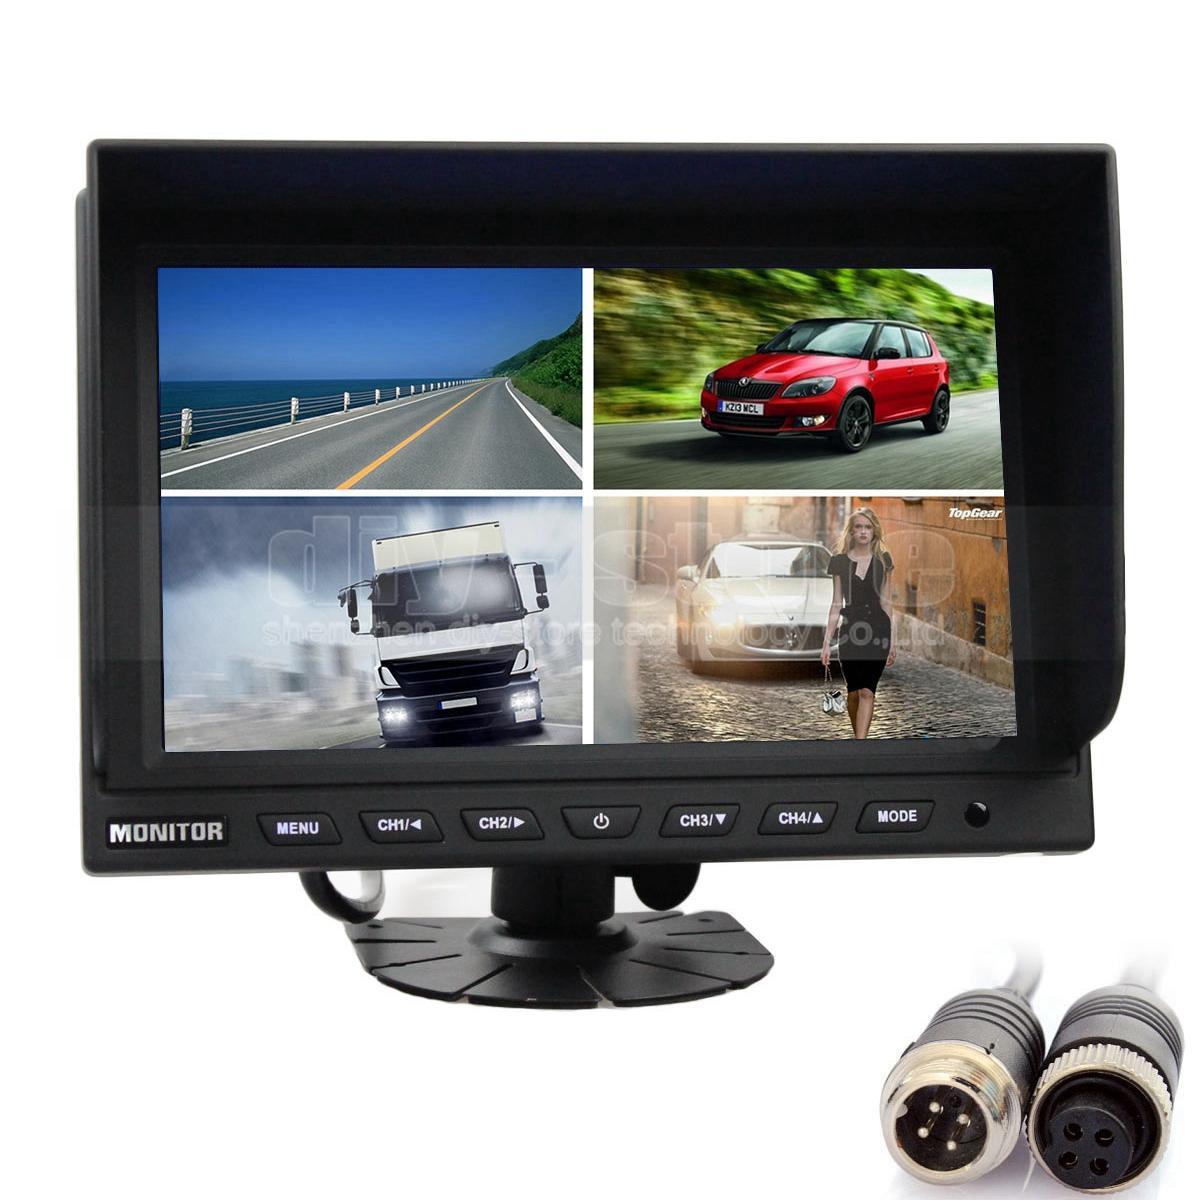 DIYKIT Rear View Montior Car Montior 4CH 4-PIN 9 Inch 4 Split Quad LCD Screen Display 12V - 24V DC